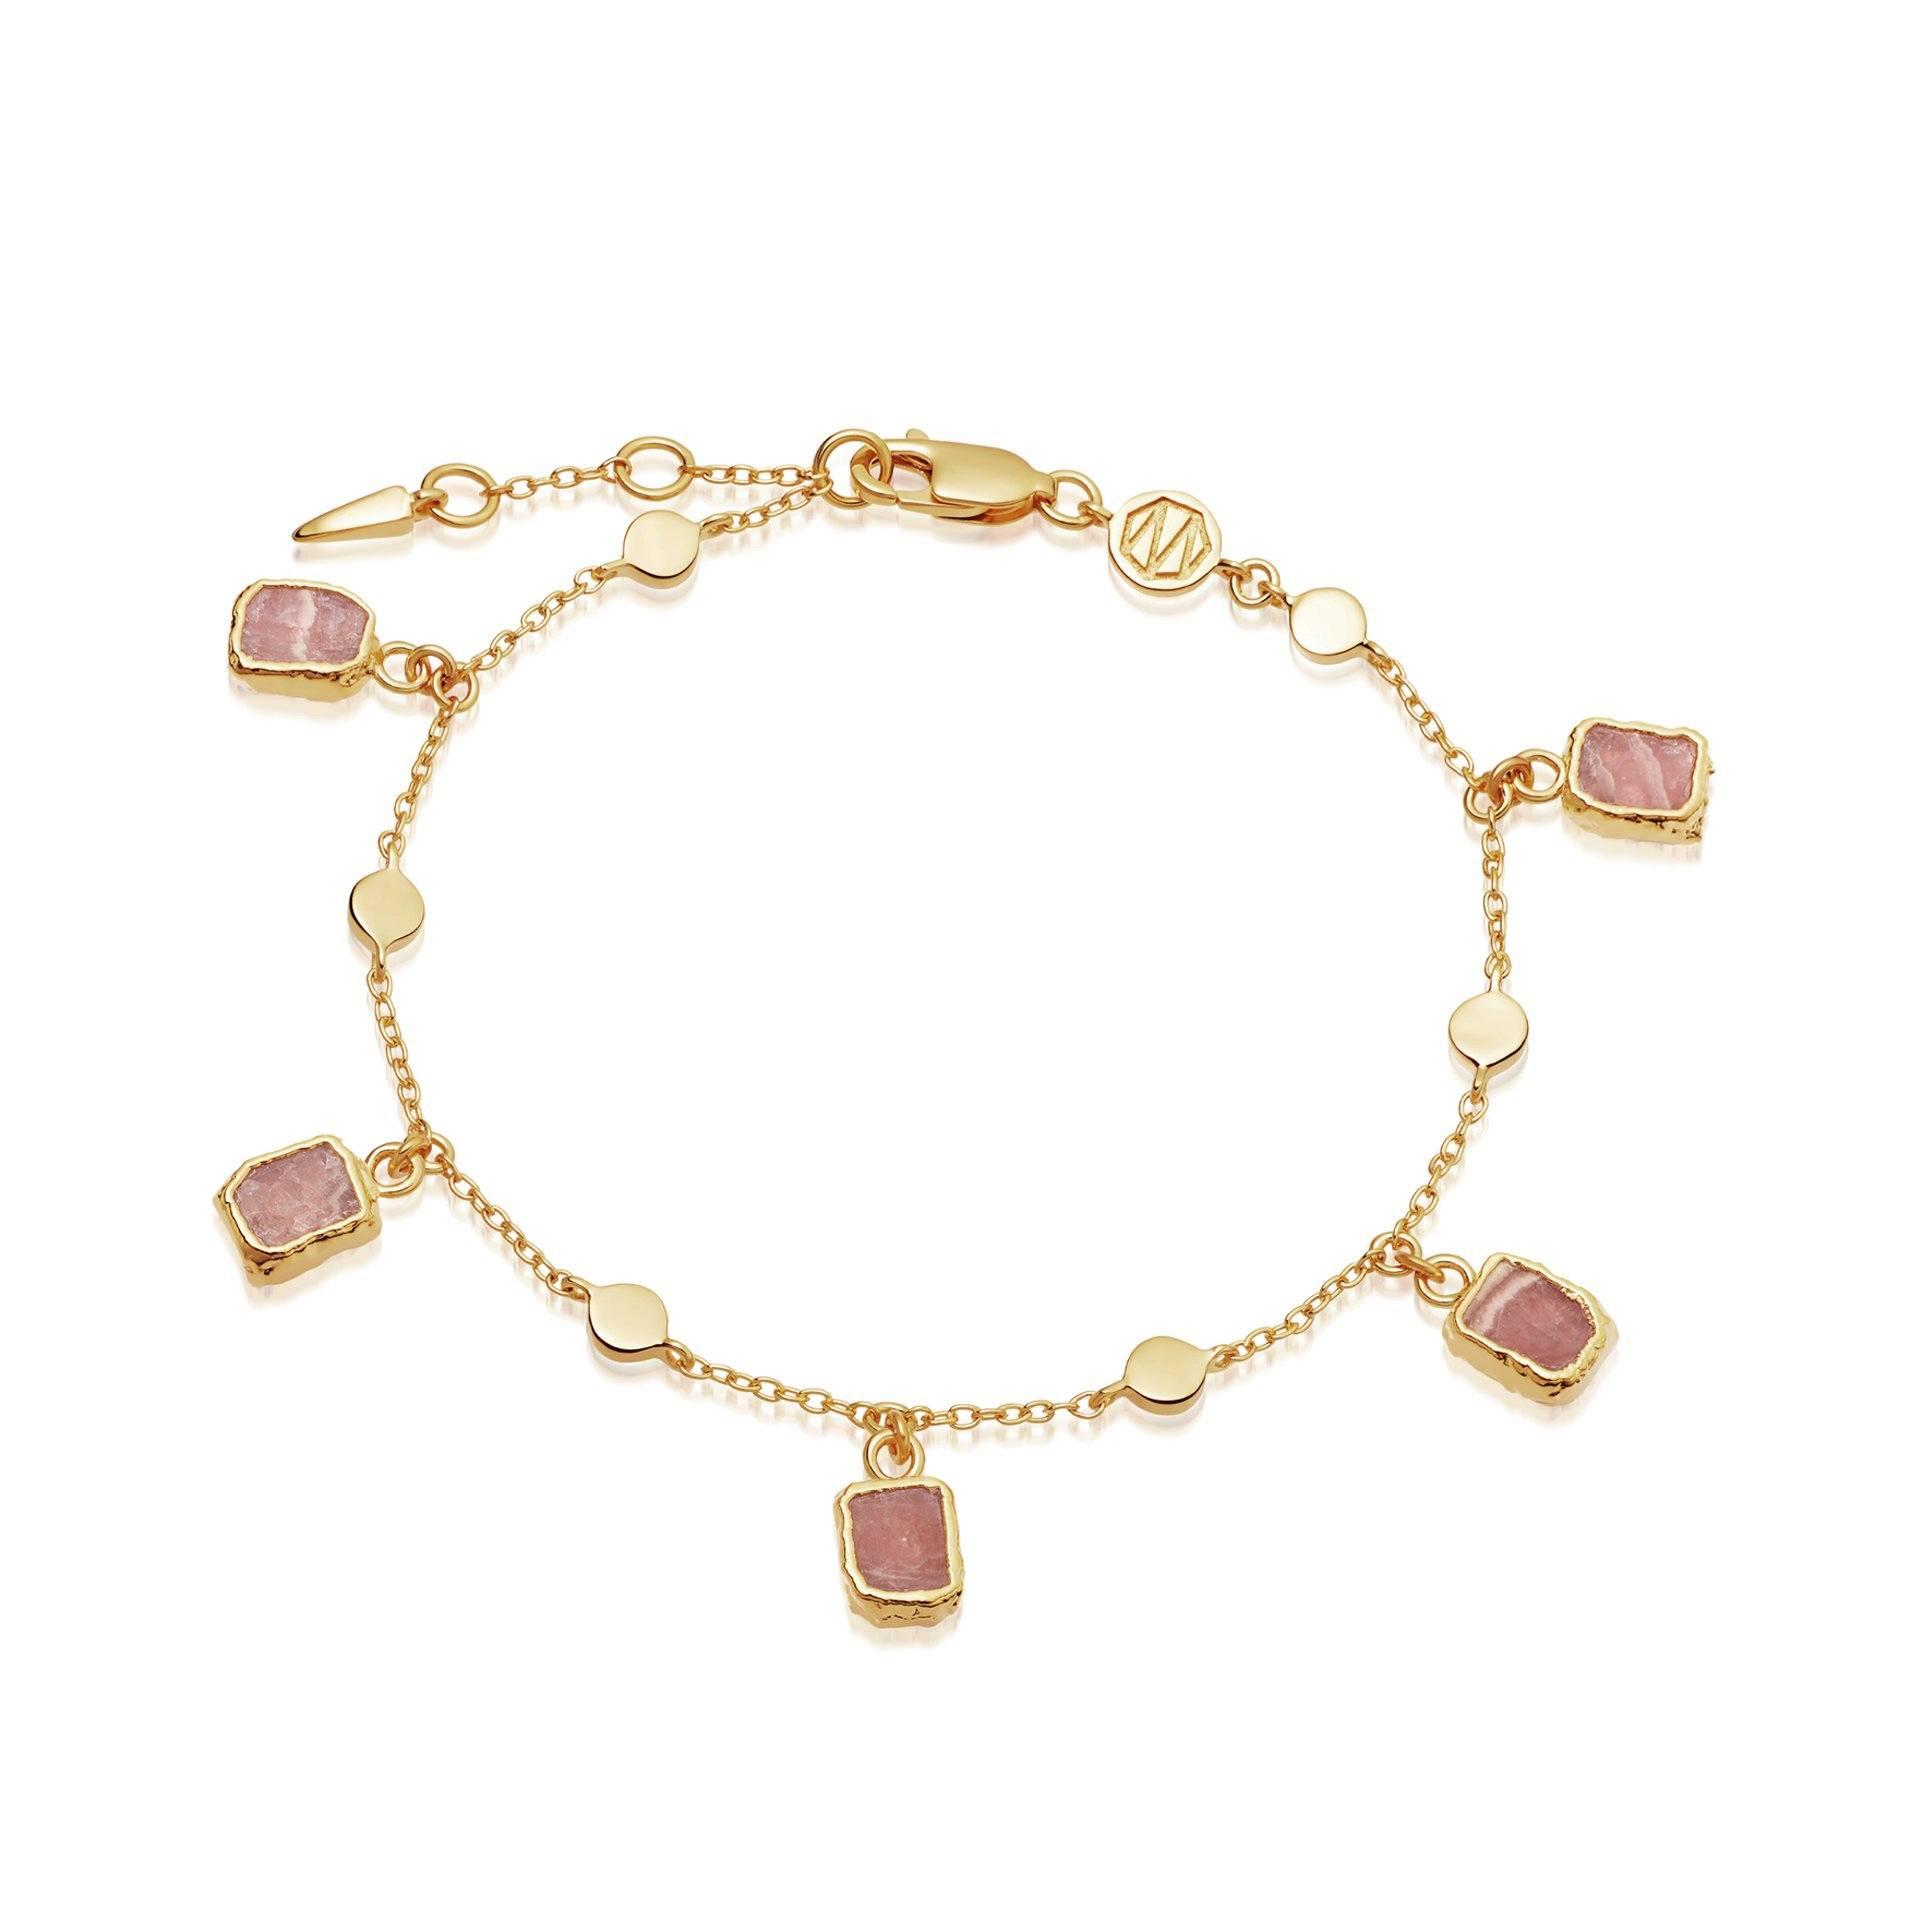 Wholesale OEM 18k gold OEM/ODM Jewelry vermeil chain bracelet with Pink Rhodochrosite crystals personalised custom design service